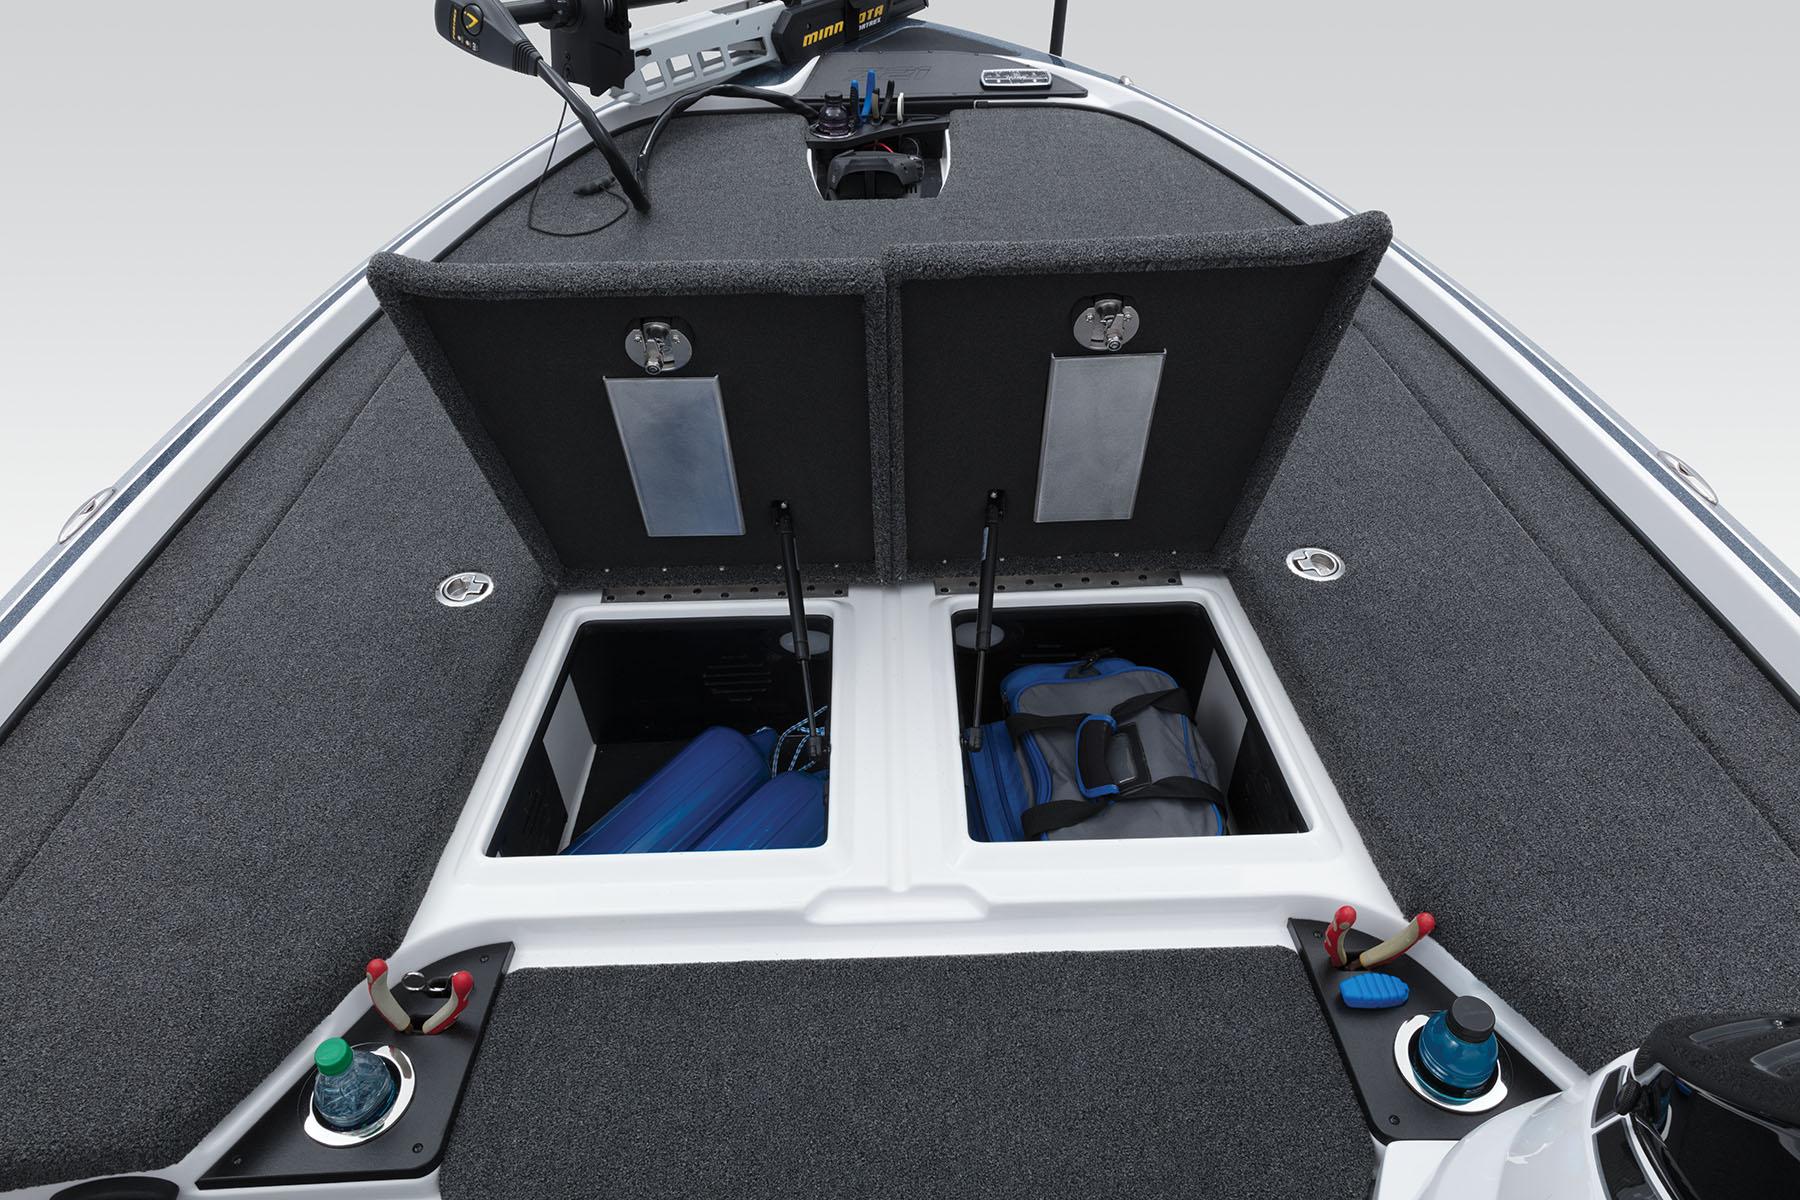 Mesmerizing Nitro B Boat Wiring Diagram Contemporary Best Image